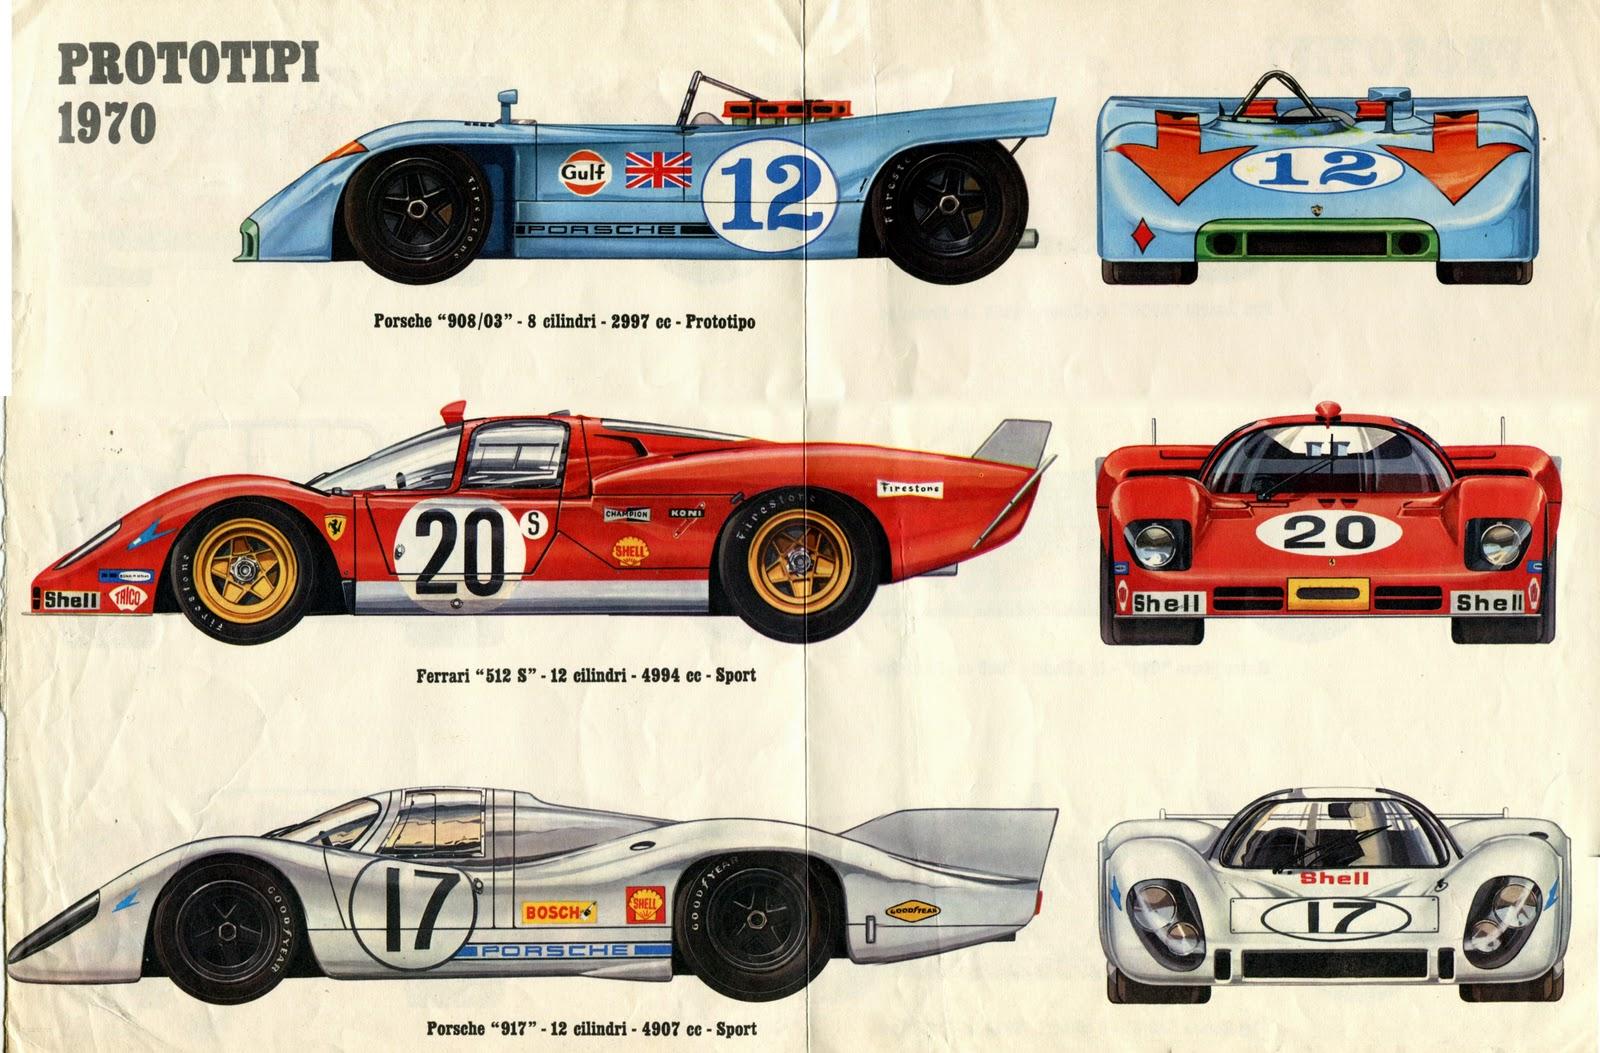 Vintage Sports Car Inc And Historic Race Car